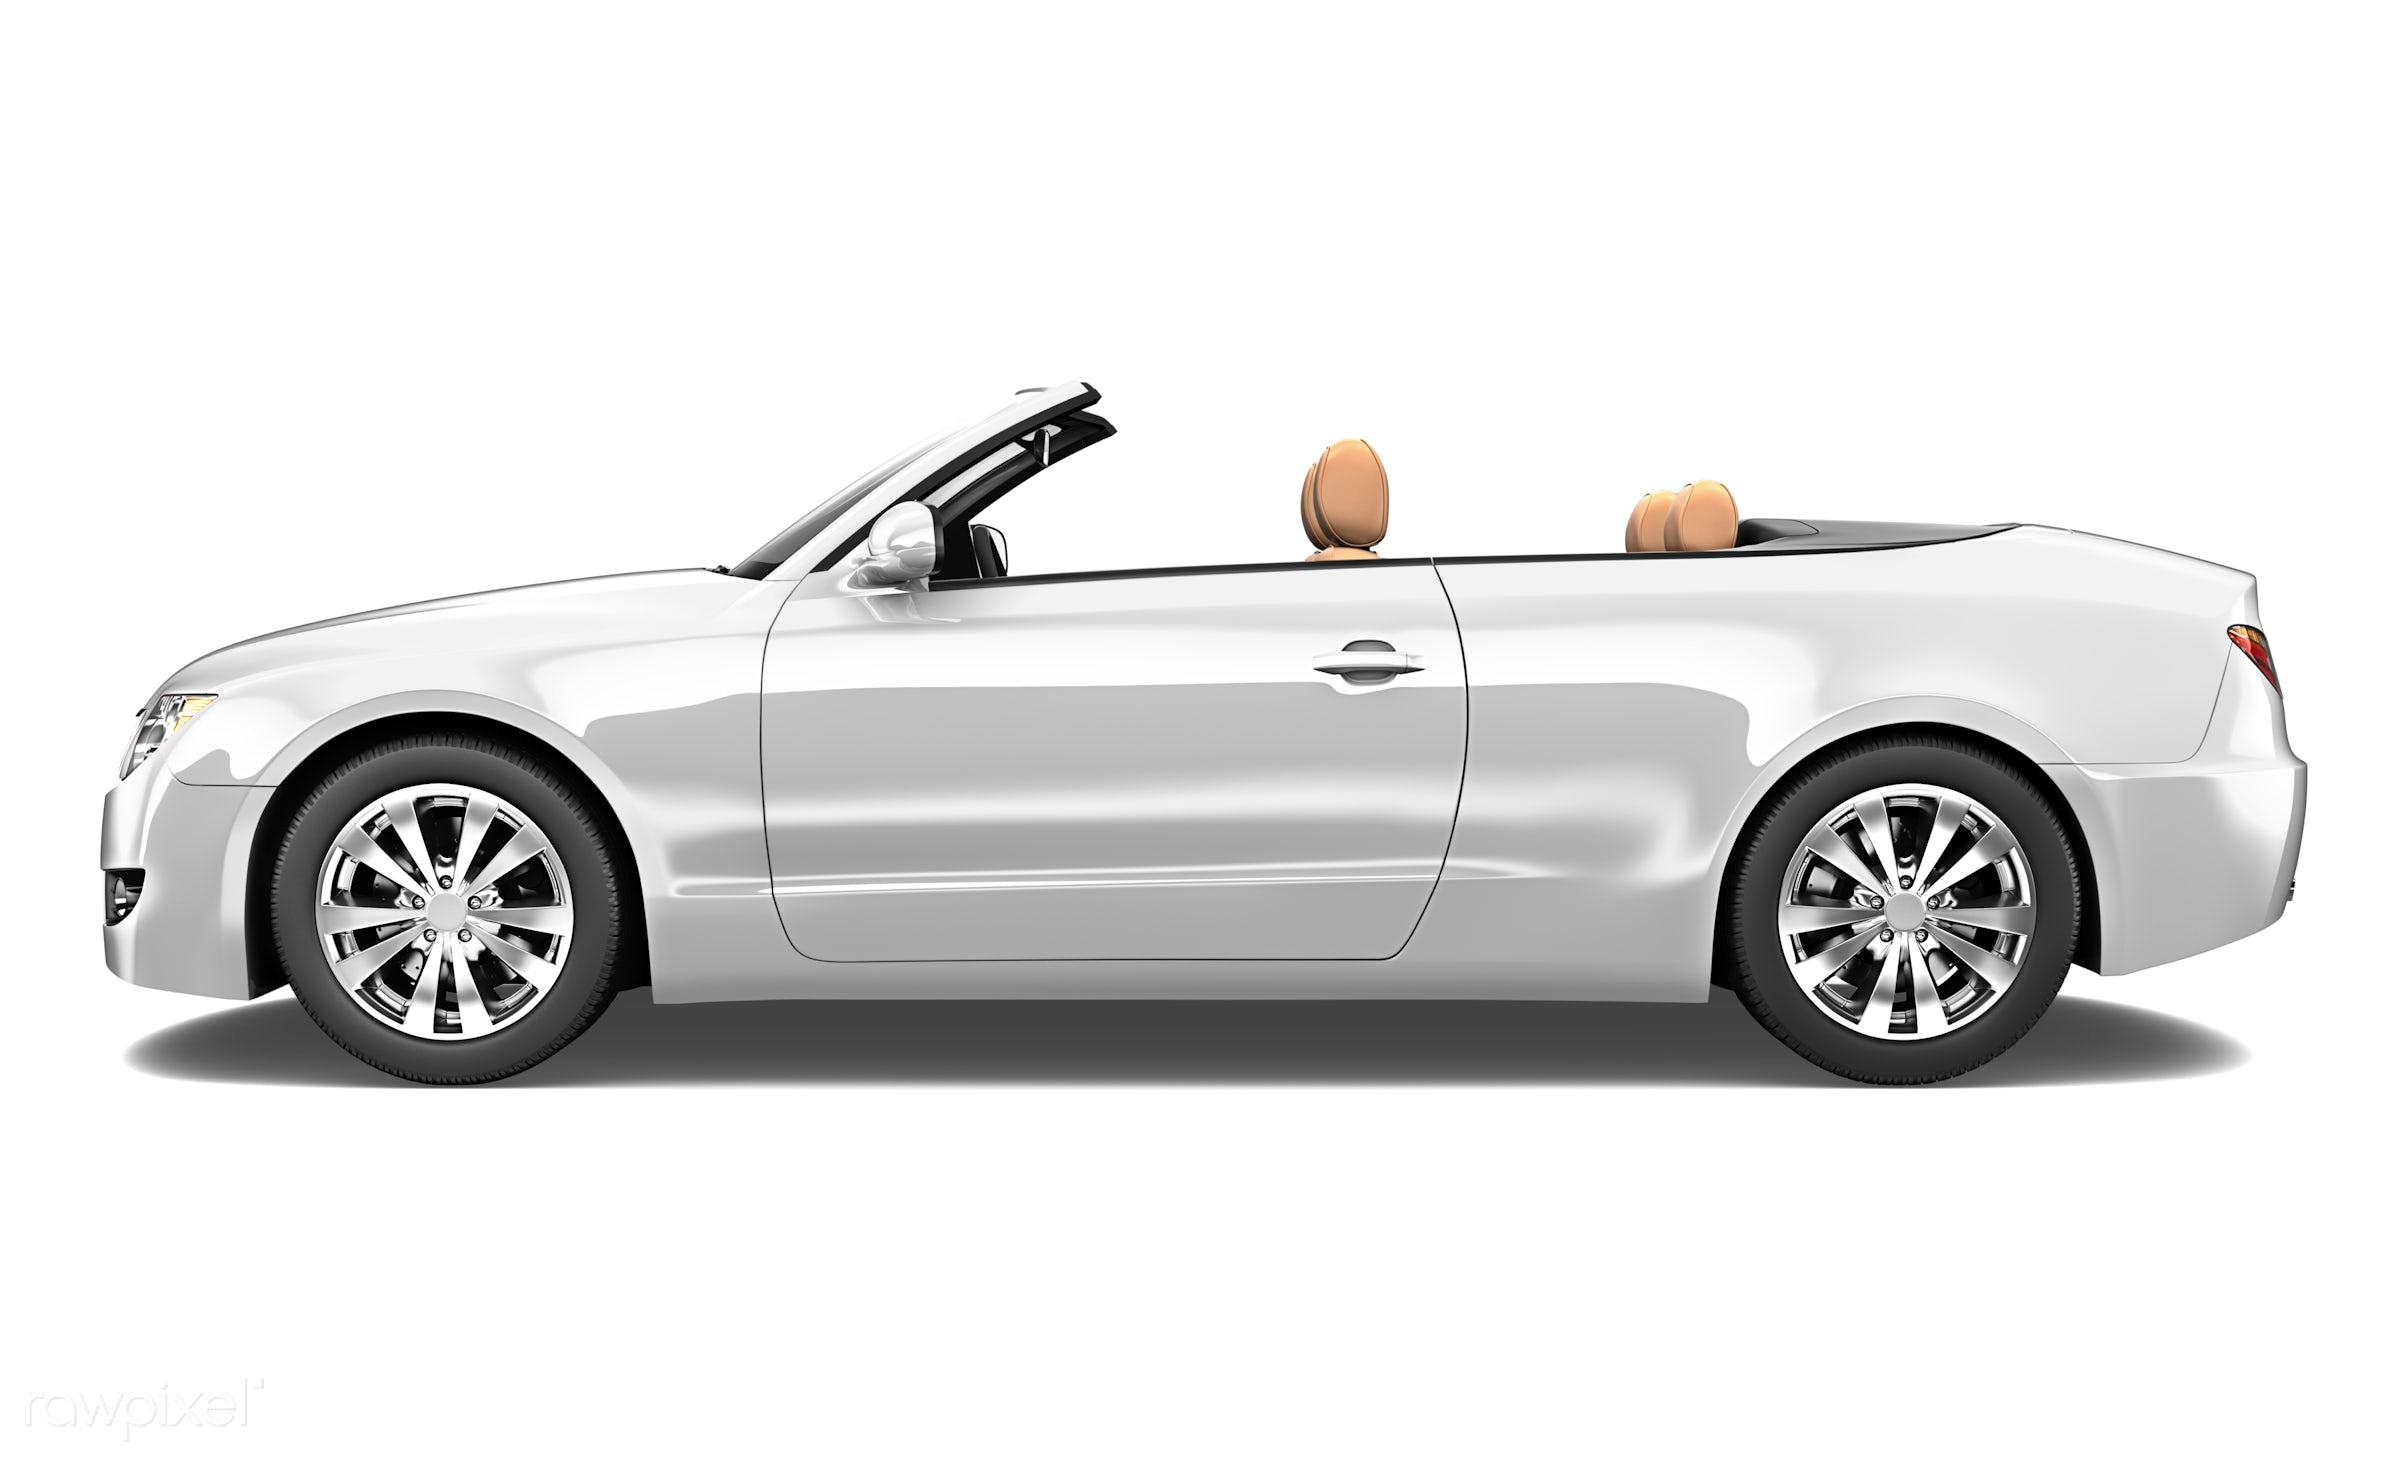 Three dimensional image of car - 3d, automobile, automotive, brandless, bronze, car, concept car, elegant, graphic, holiday...